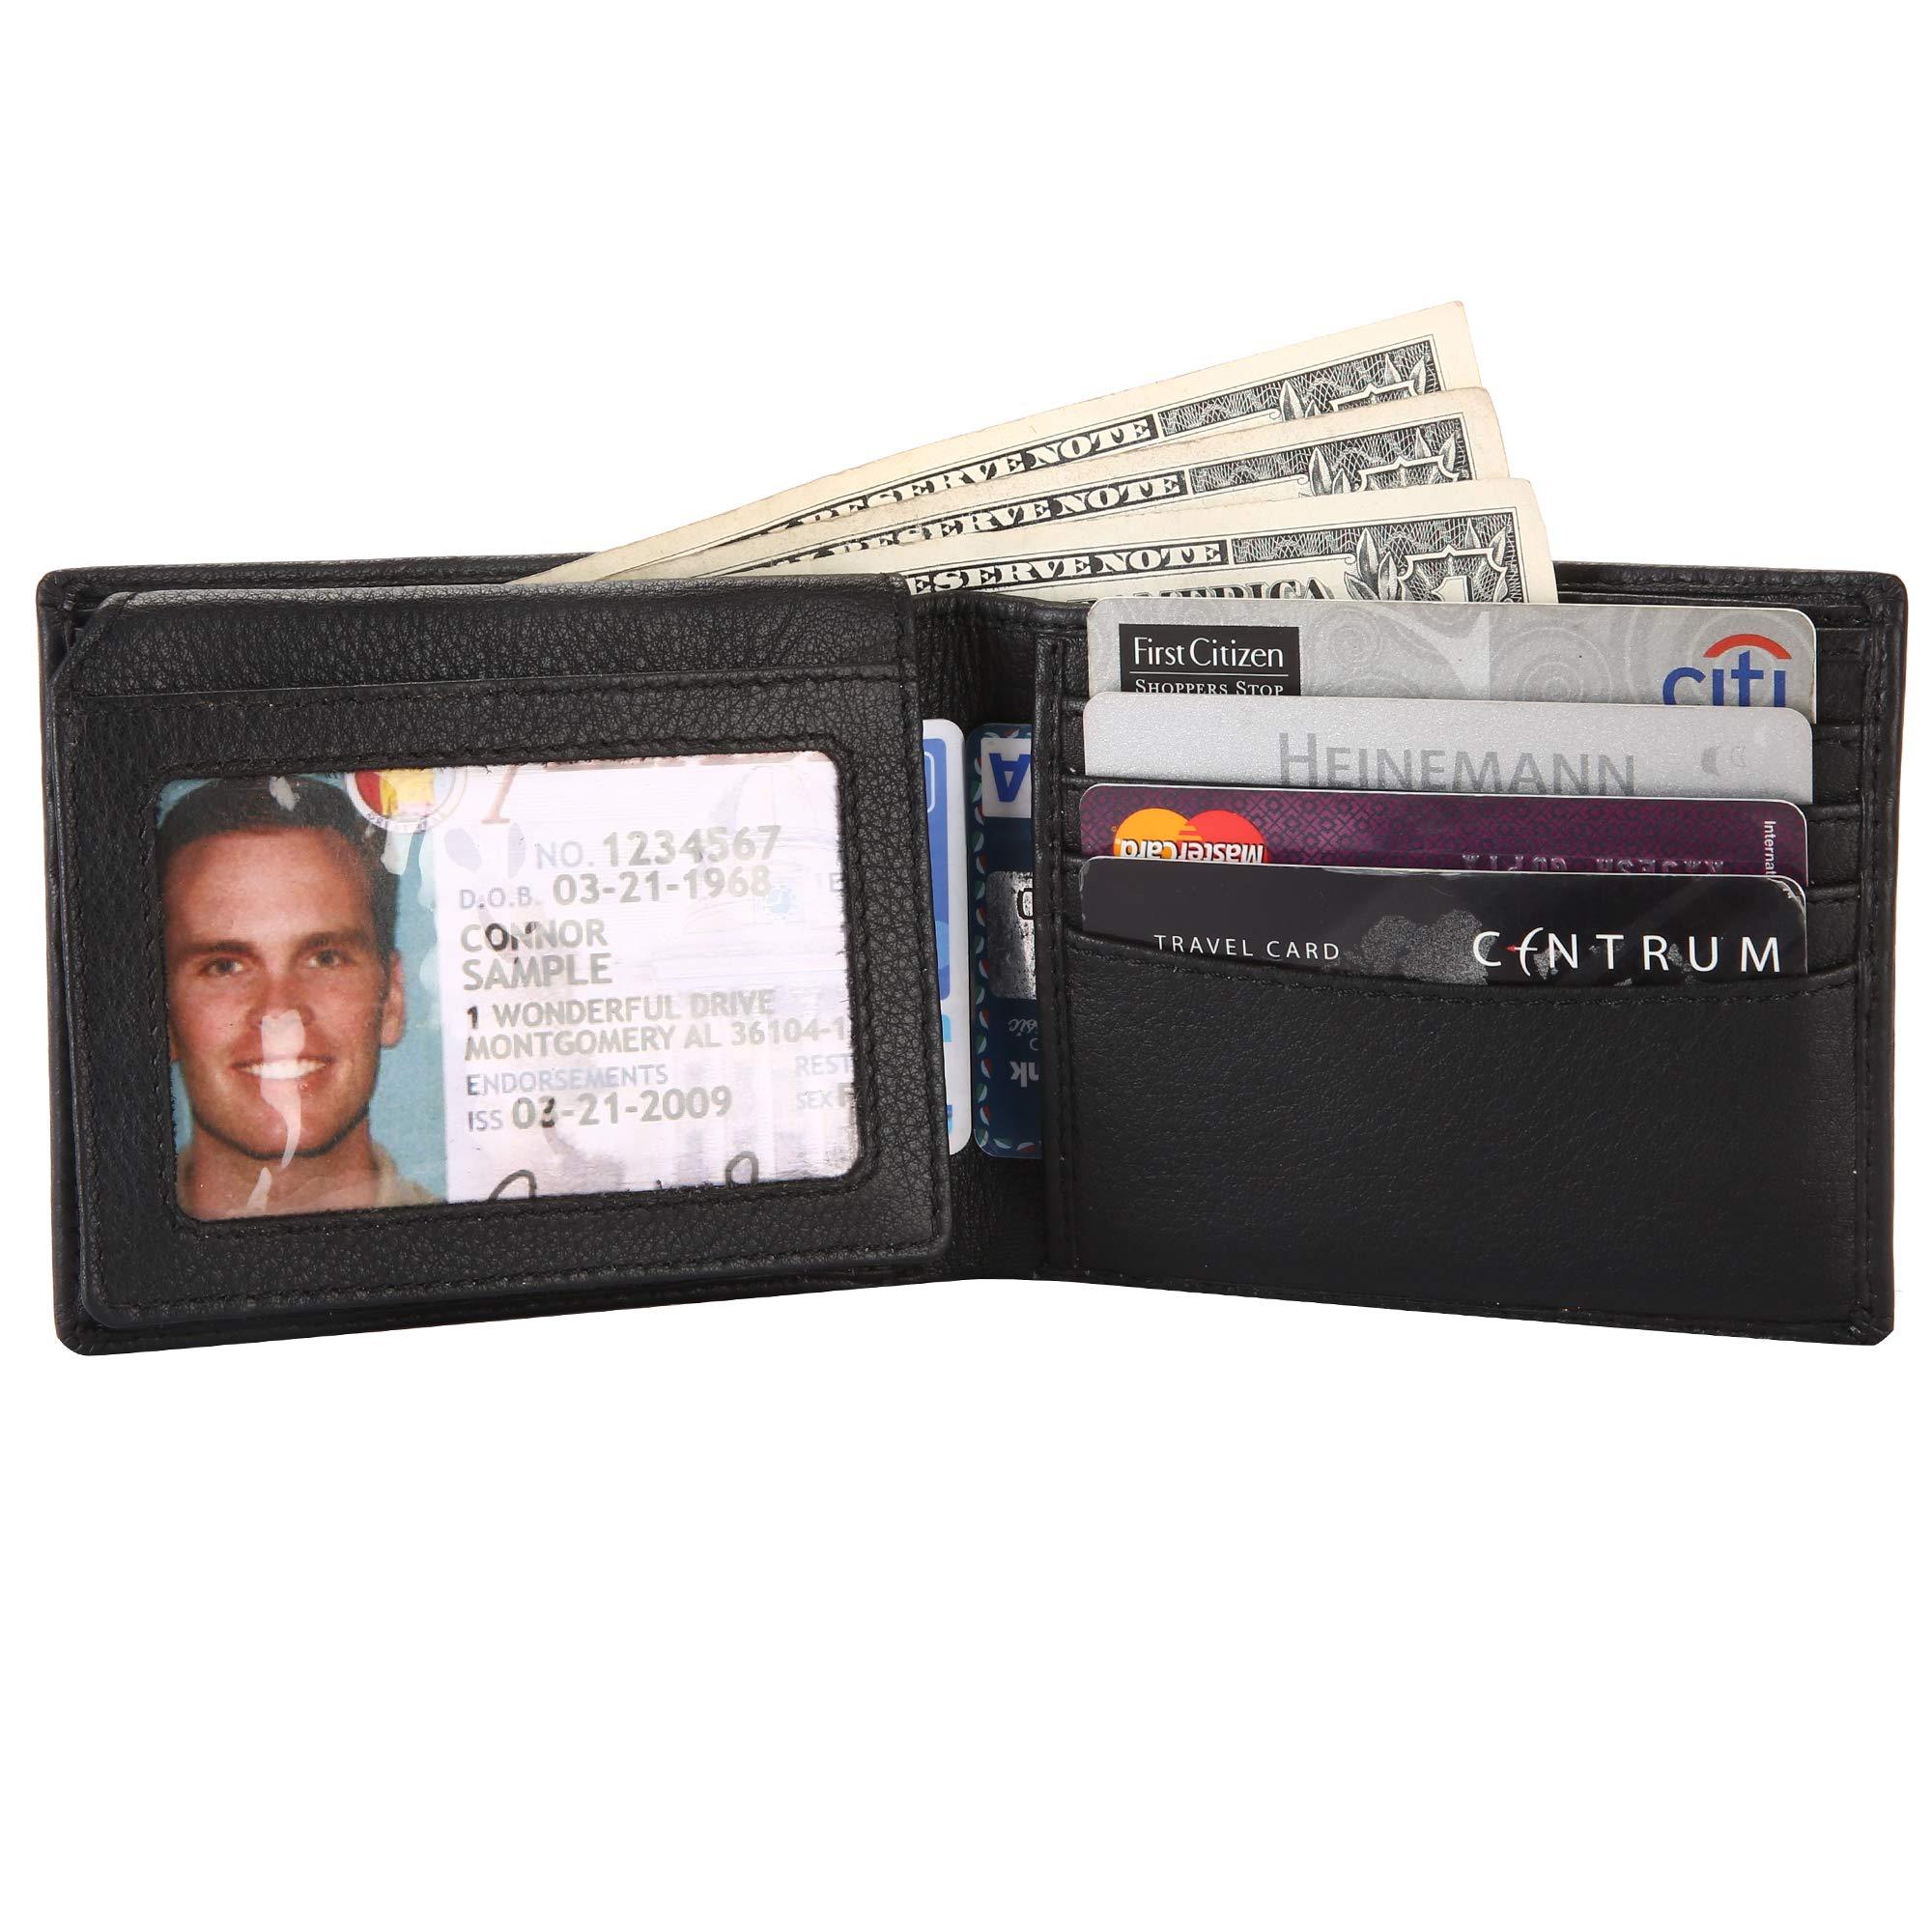 RFID Leather Bifold Wallets for Men - Slim Front Pocket Secure Credit Card Holder with ID Window Mens Wallet Gift Box (Black)